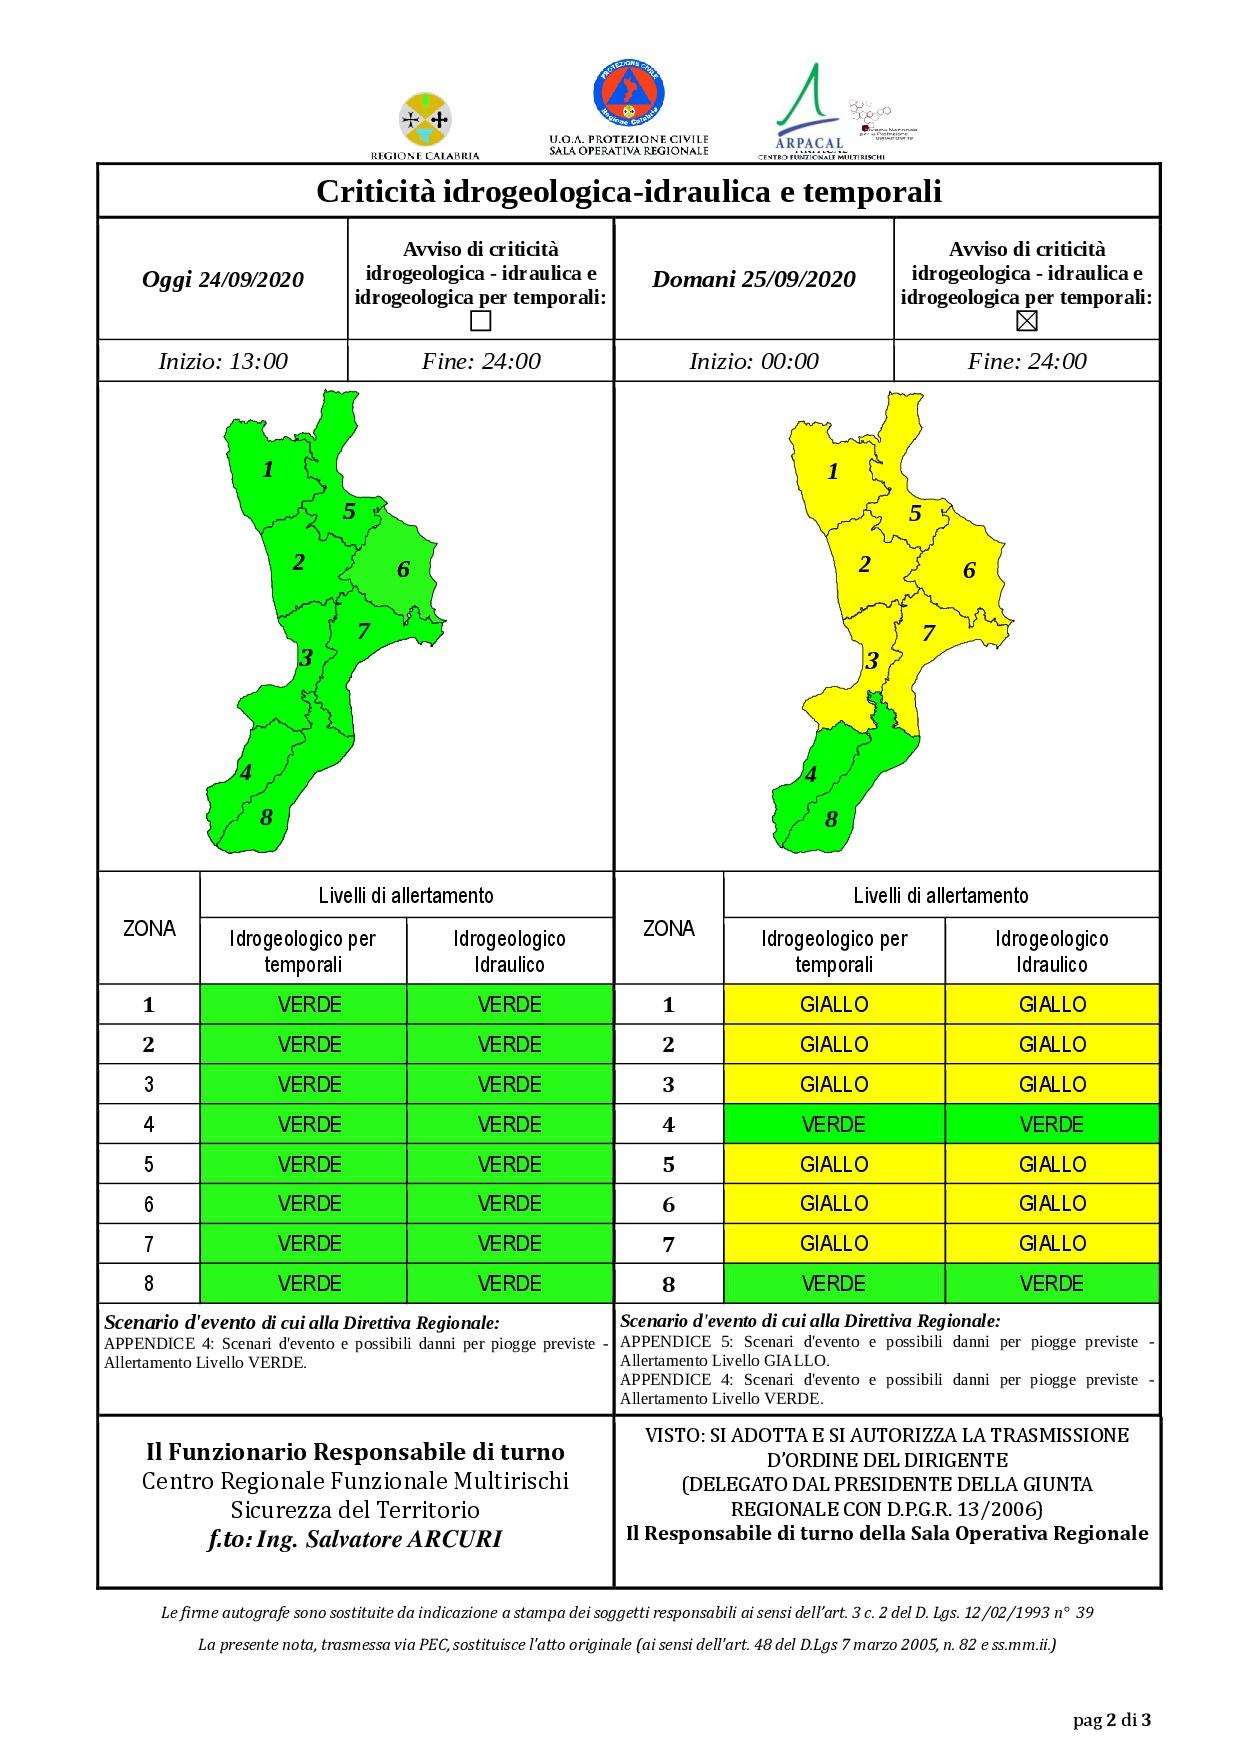 Criticità idrogeologica-idraulica e temporali in Calabria 24-09-2020